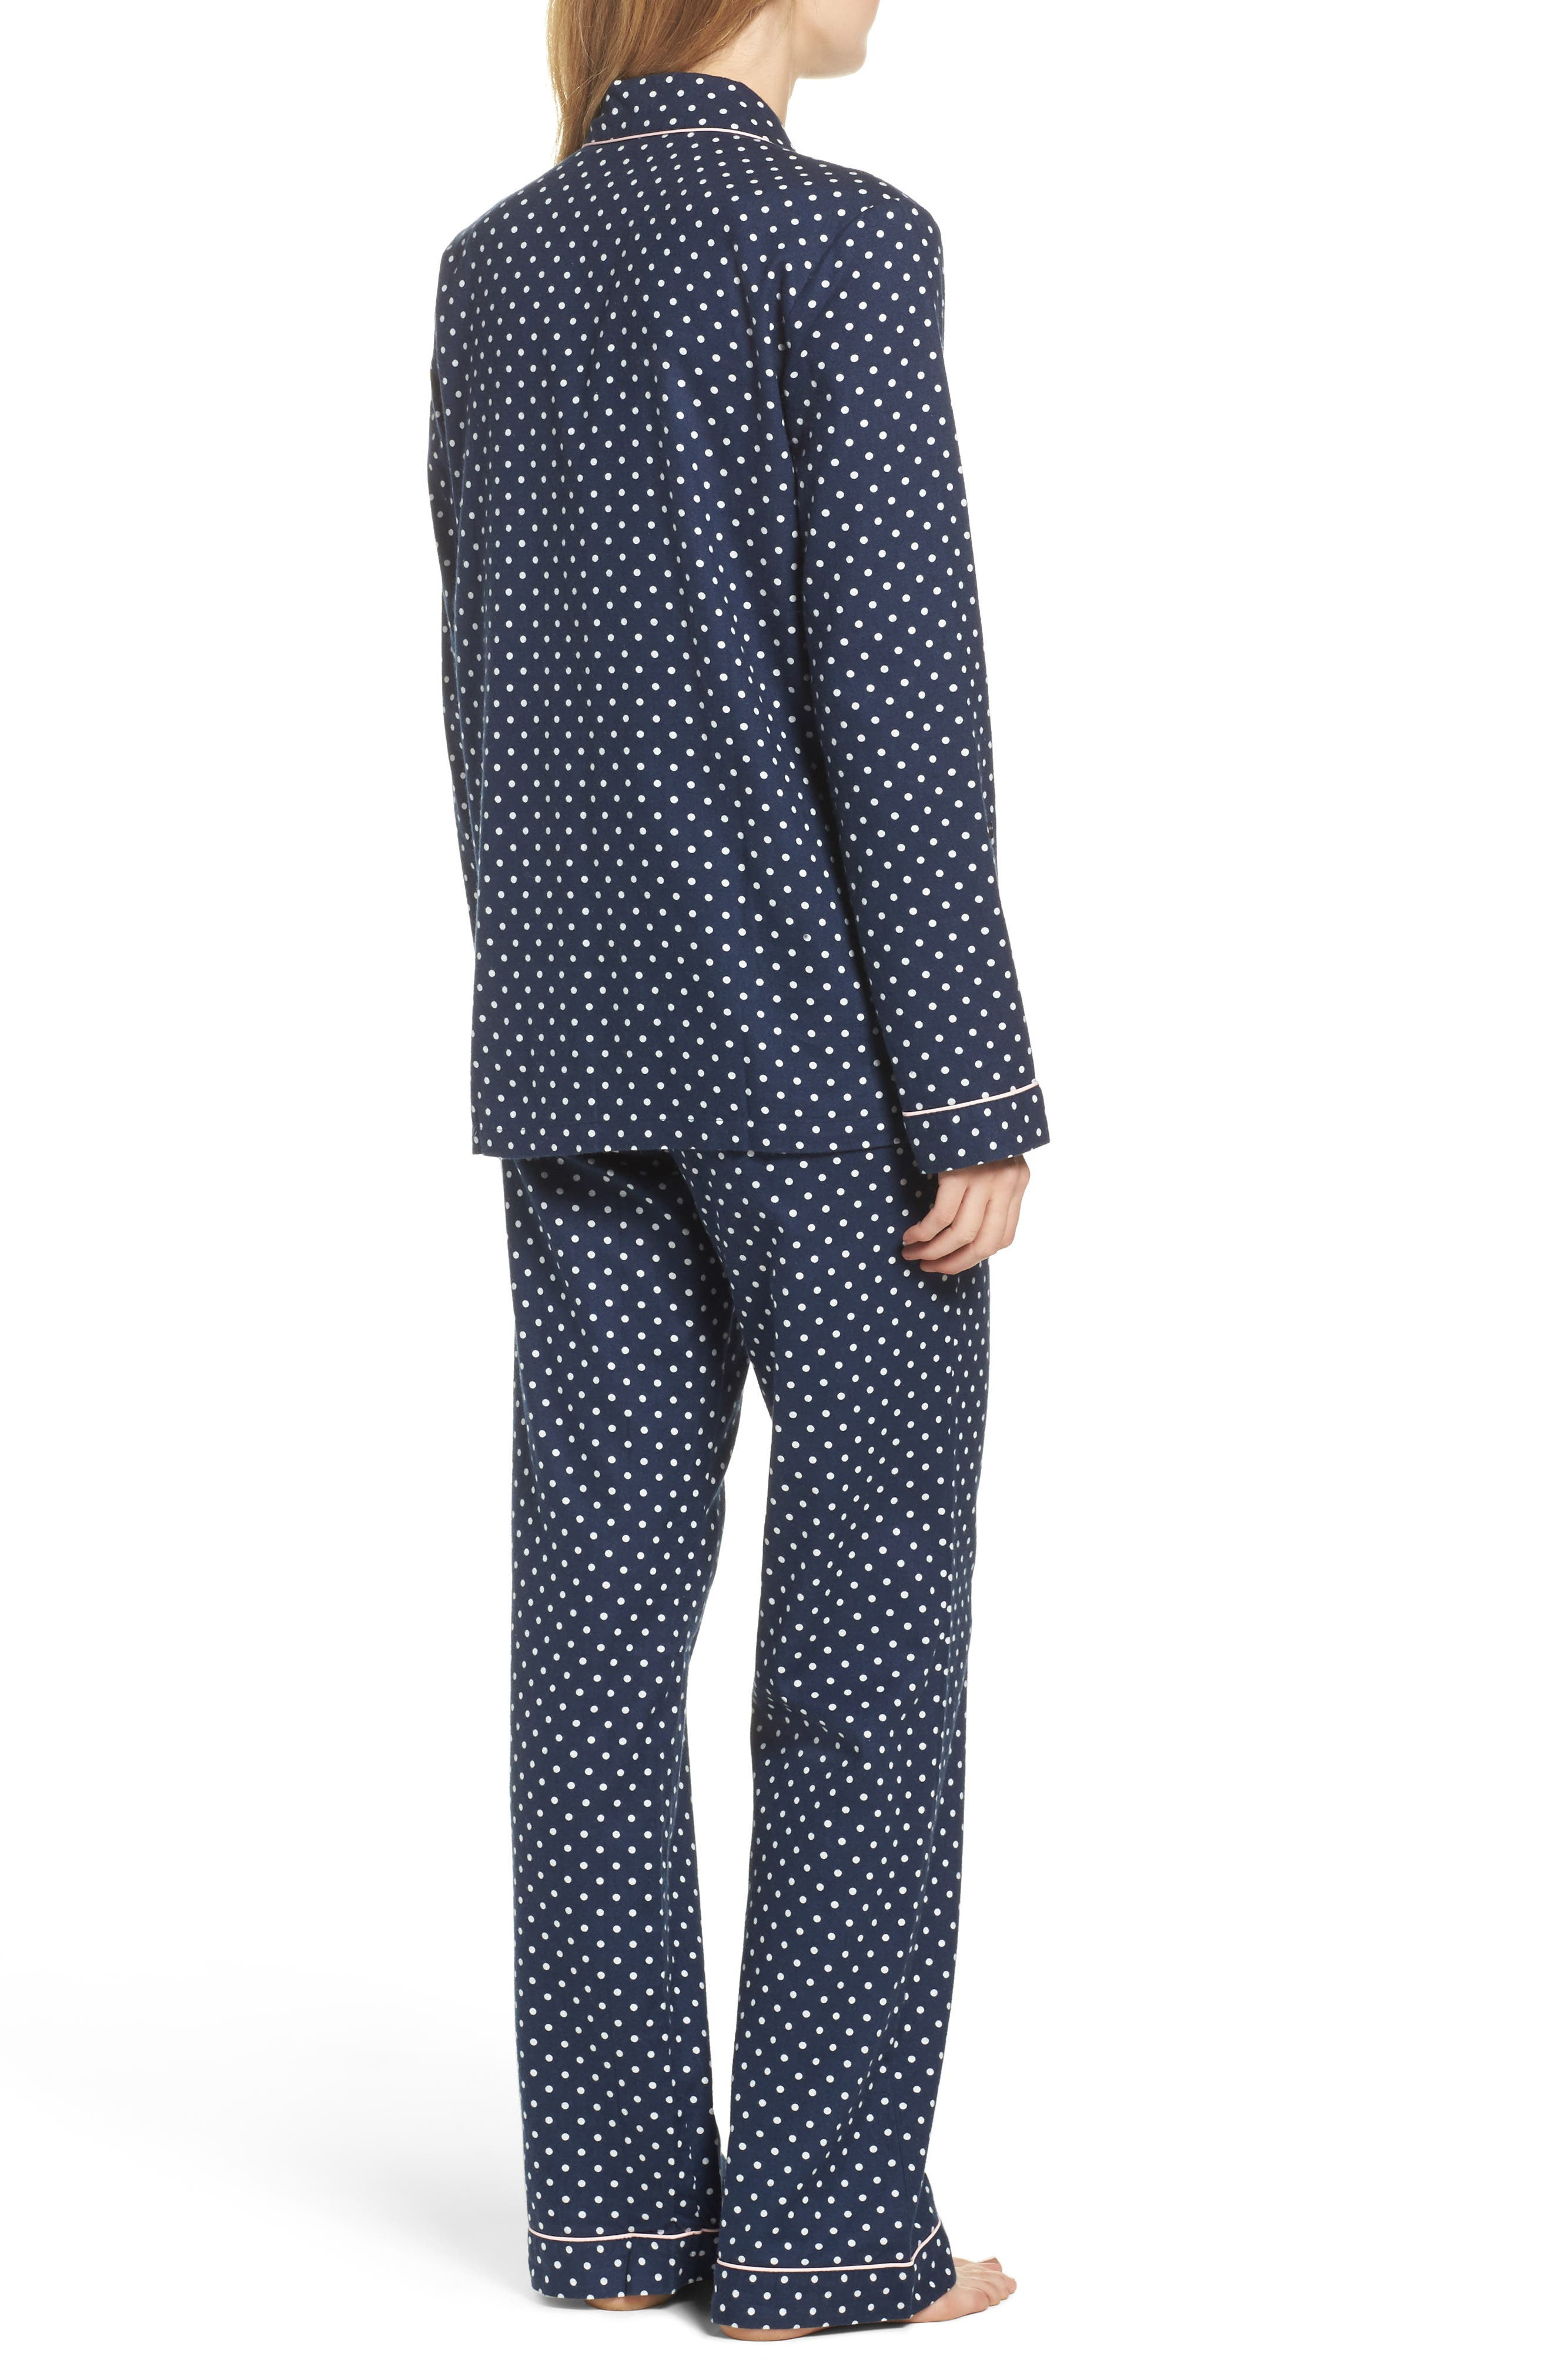 Cotton Twill Pajamas,                             Alternate thumbnail 2, color,                             414